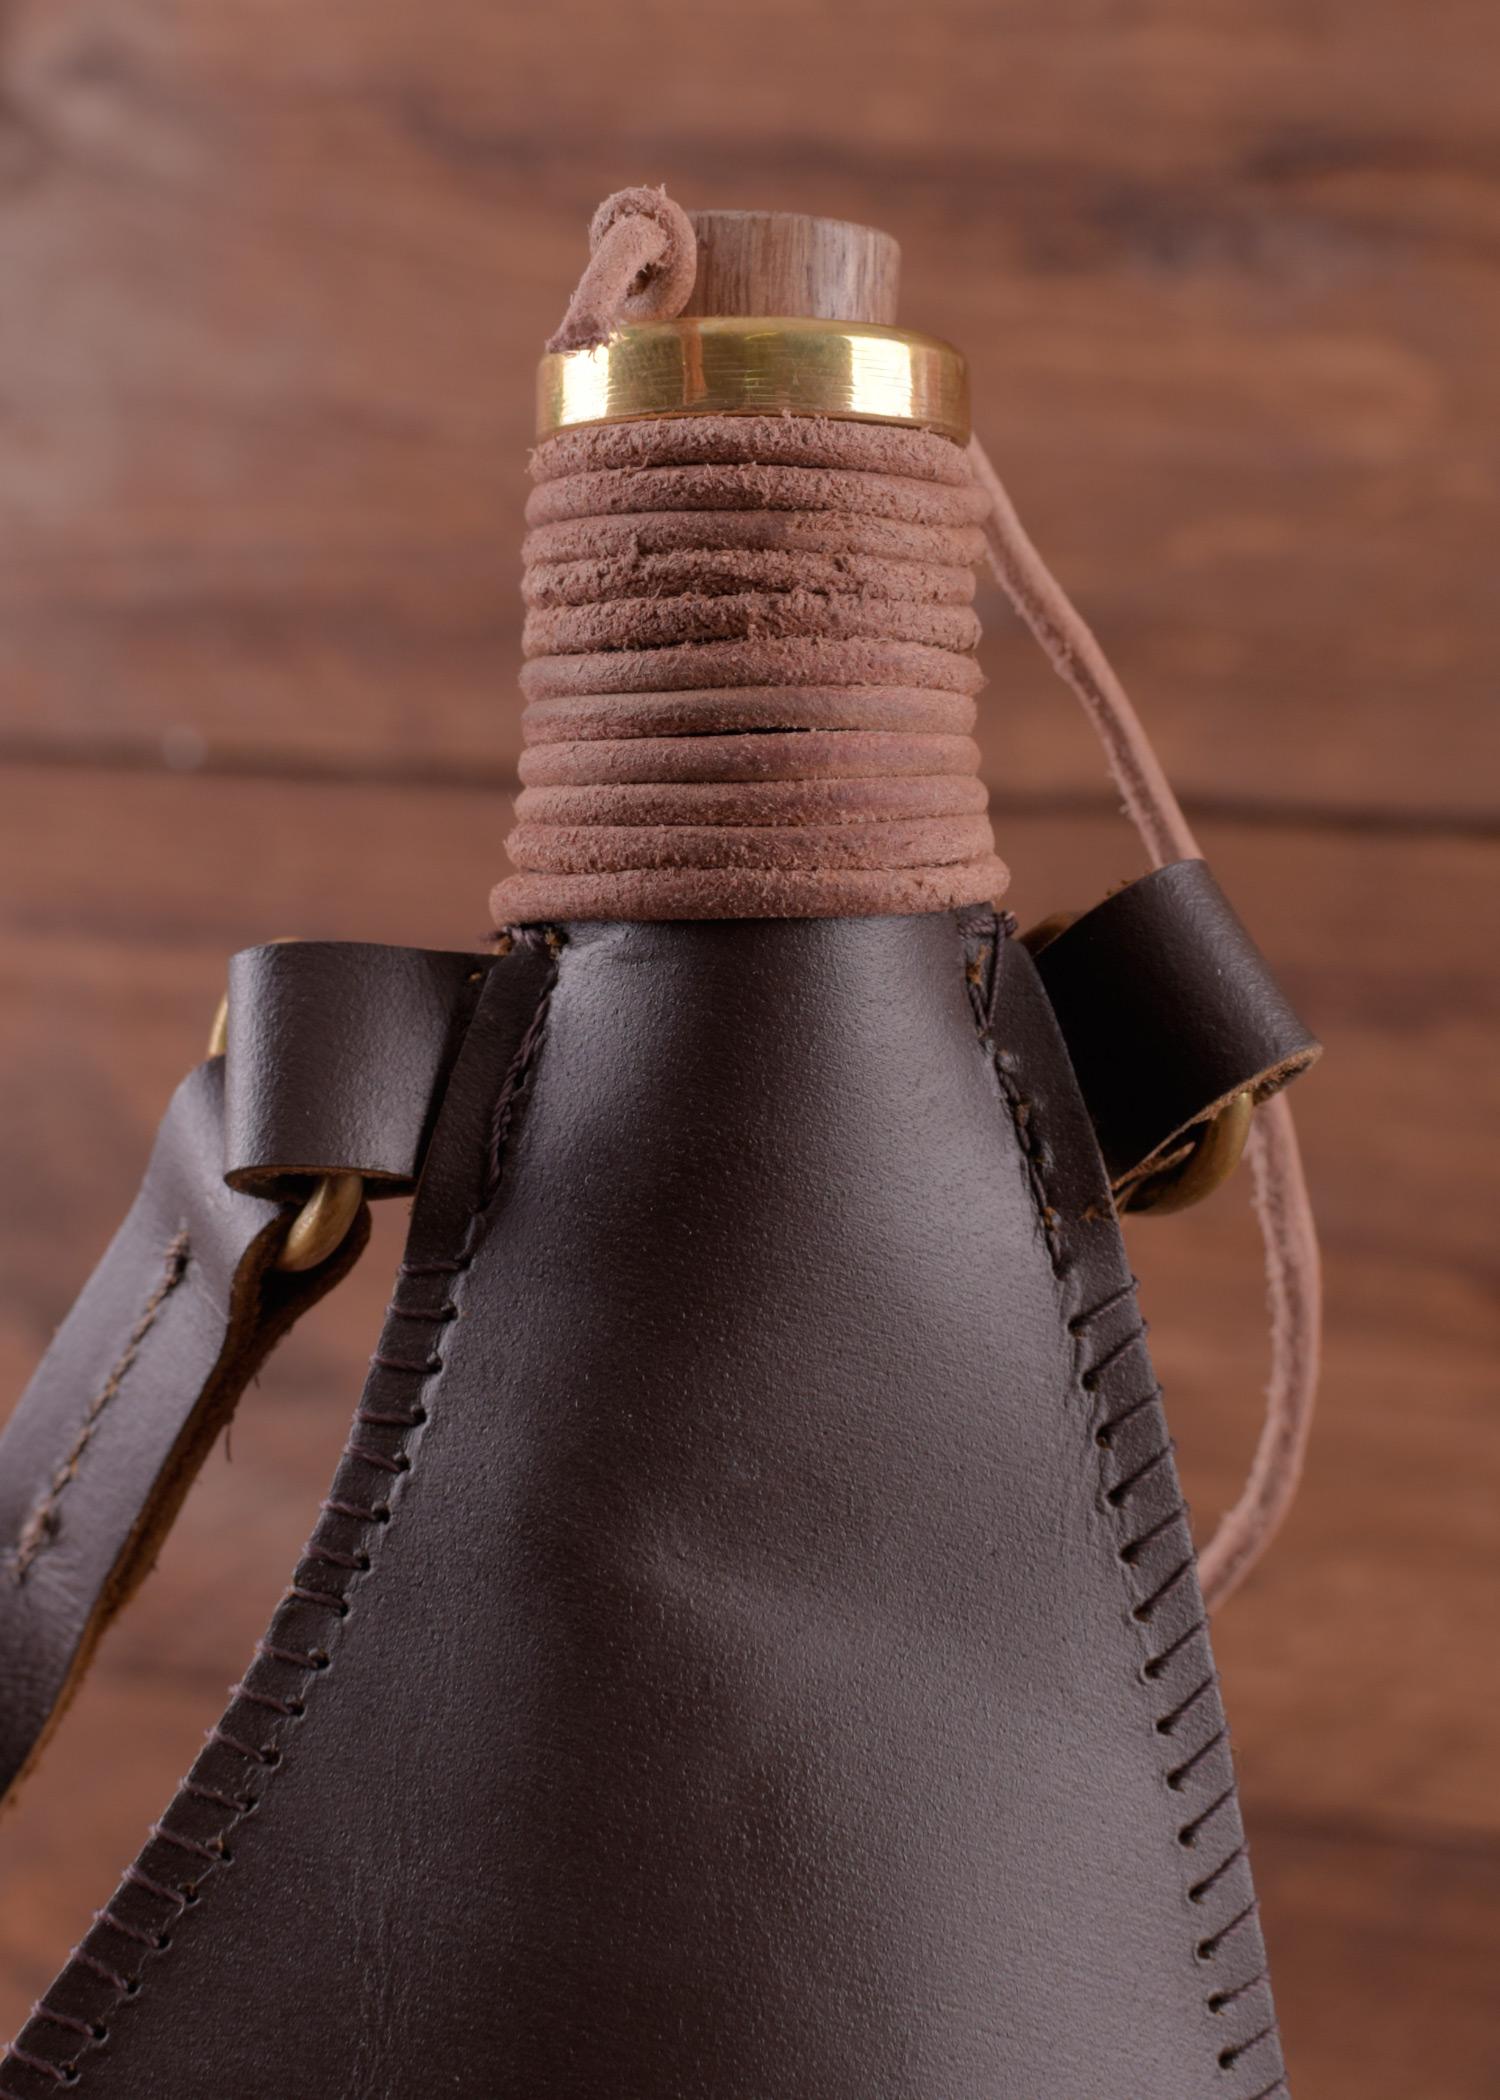 trinkschlauch aus leder 0 5l wasser flasche transport beutel ebay. Black Bedroom Furniture Sets. Home Design Ideas